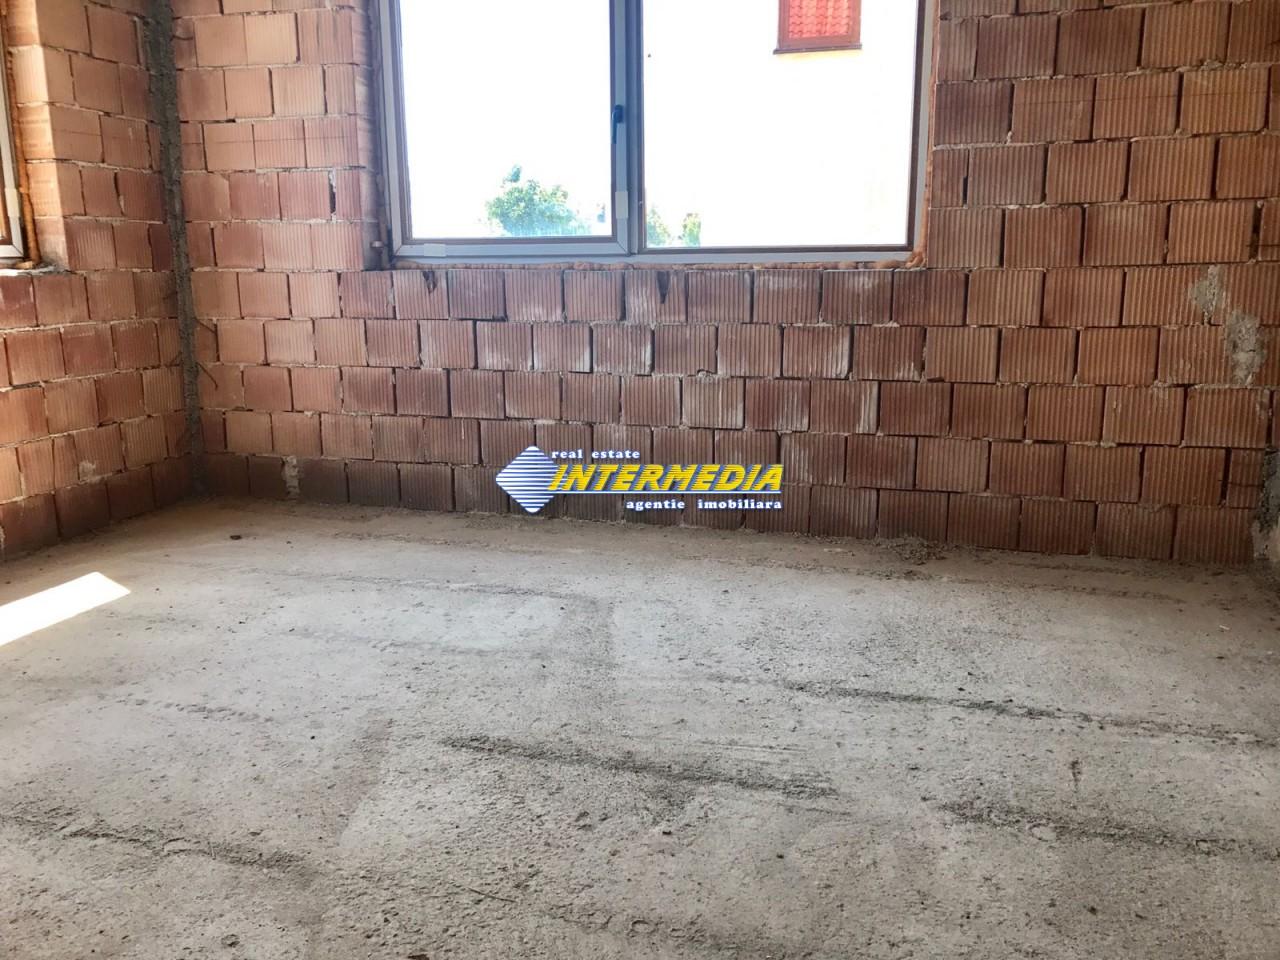 Casa in rosu de vanzare Alba Iulia cu utilitati-22465-6